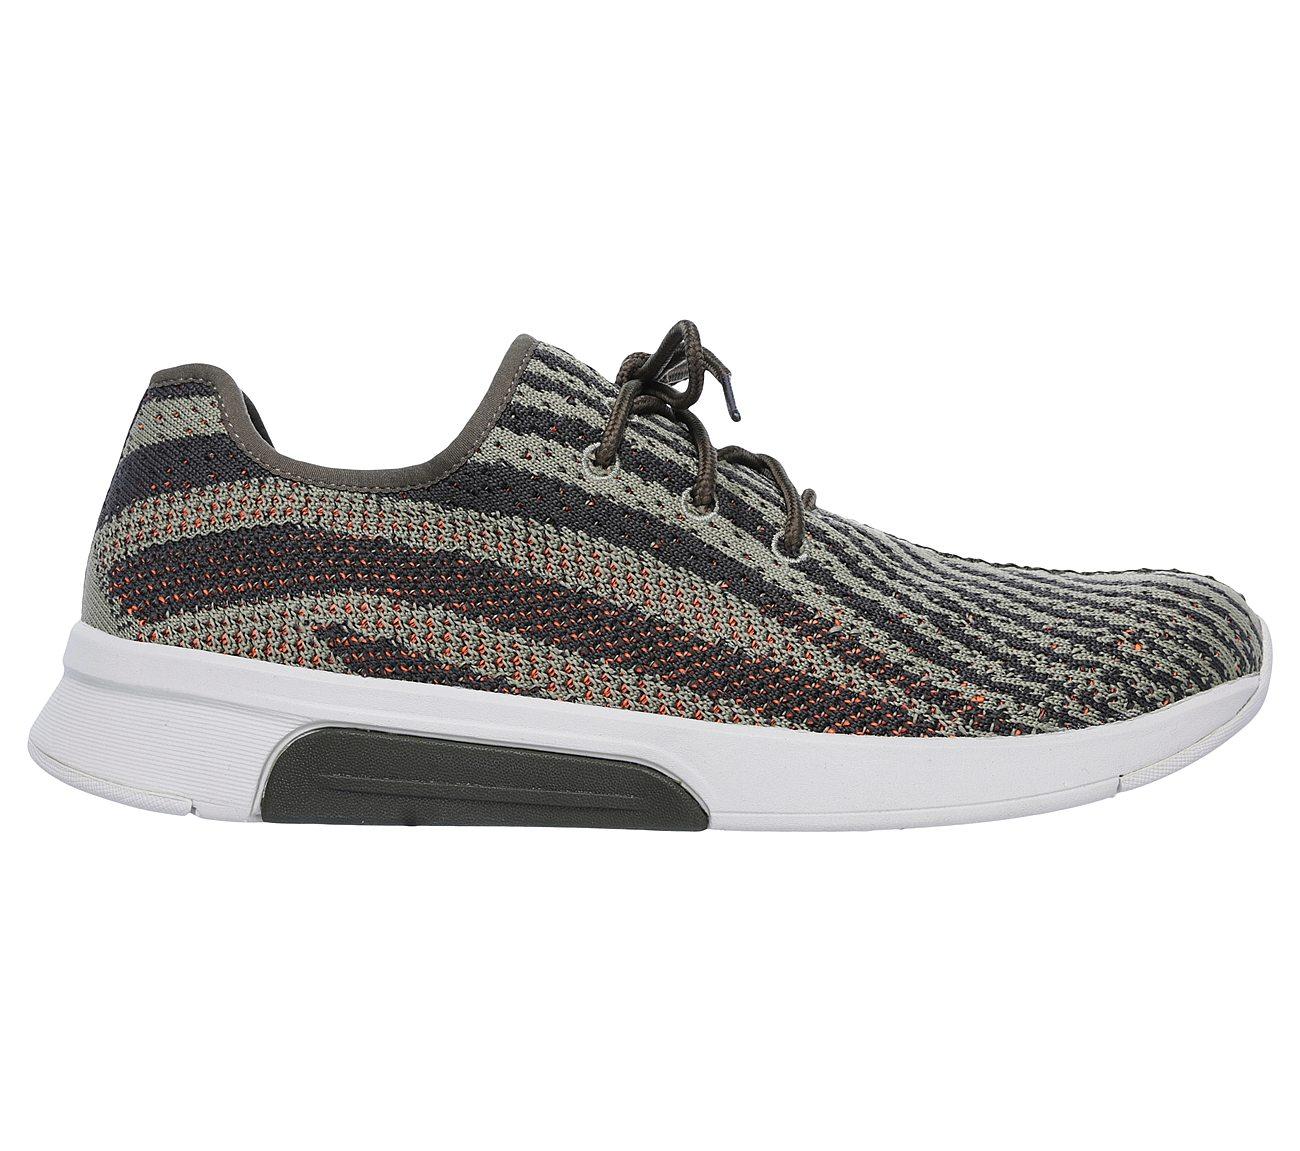 fb51e847083 Buy SKECHERS Modern Jogger - Rey Mark Nason Shoes only  95.00